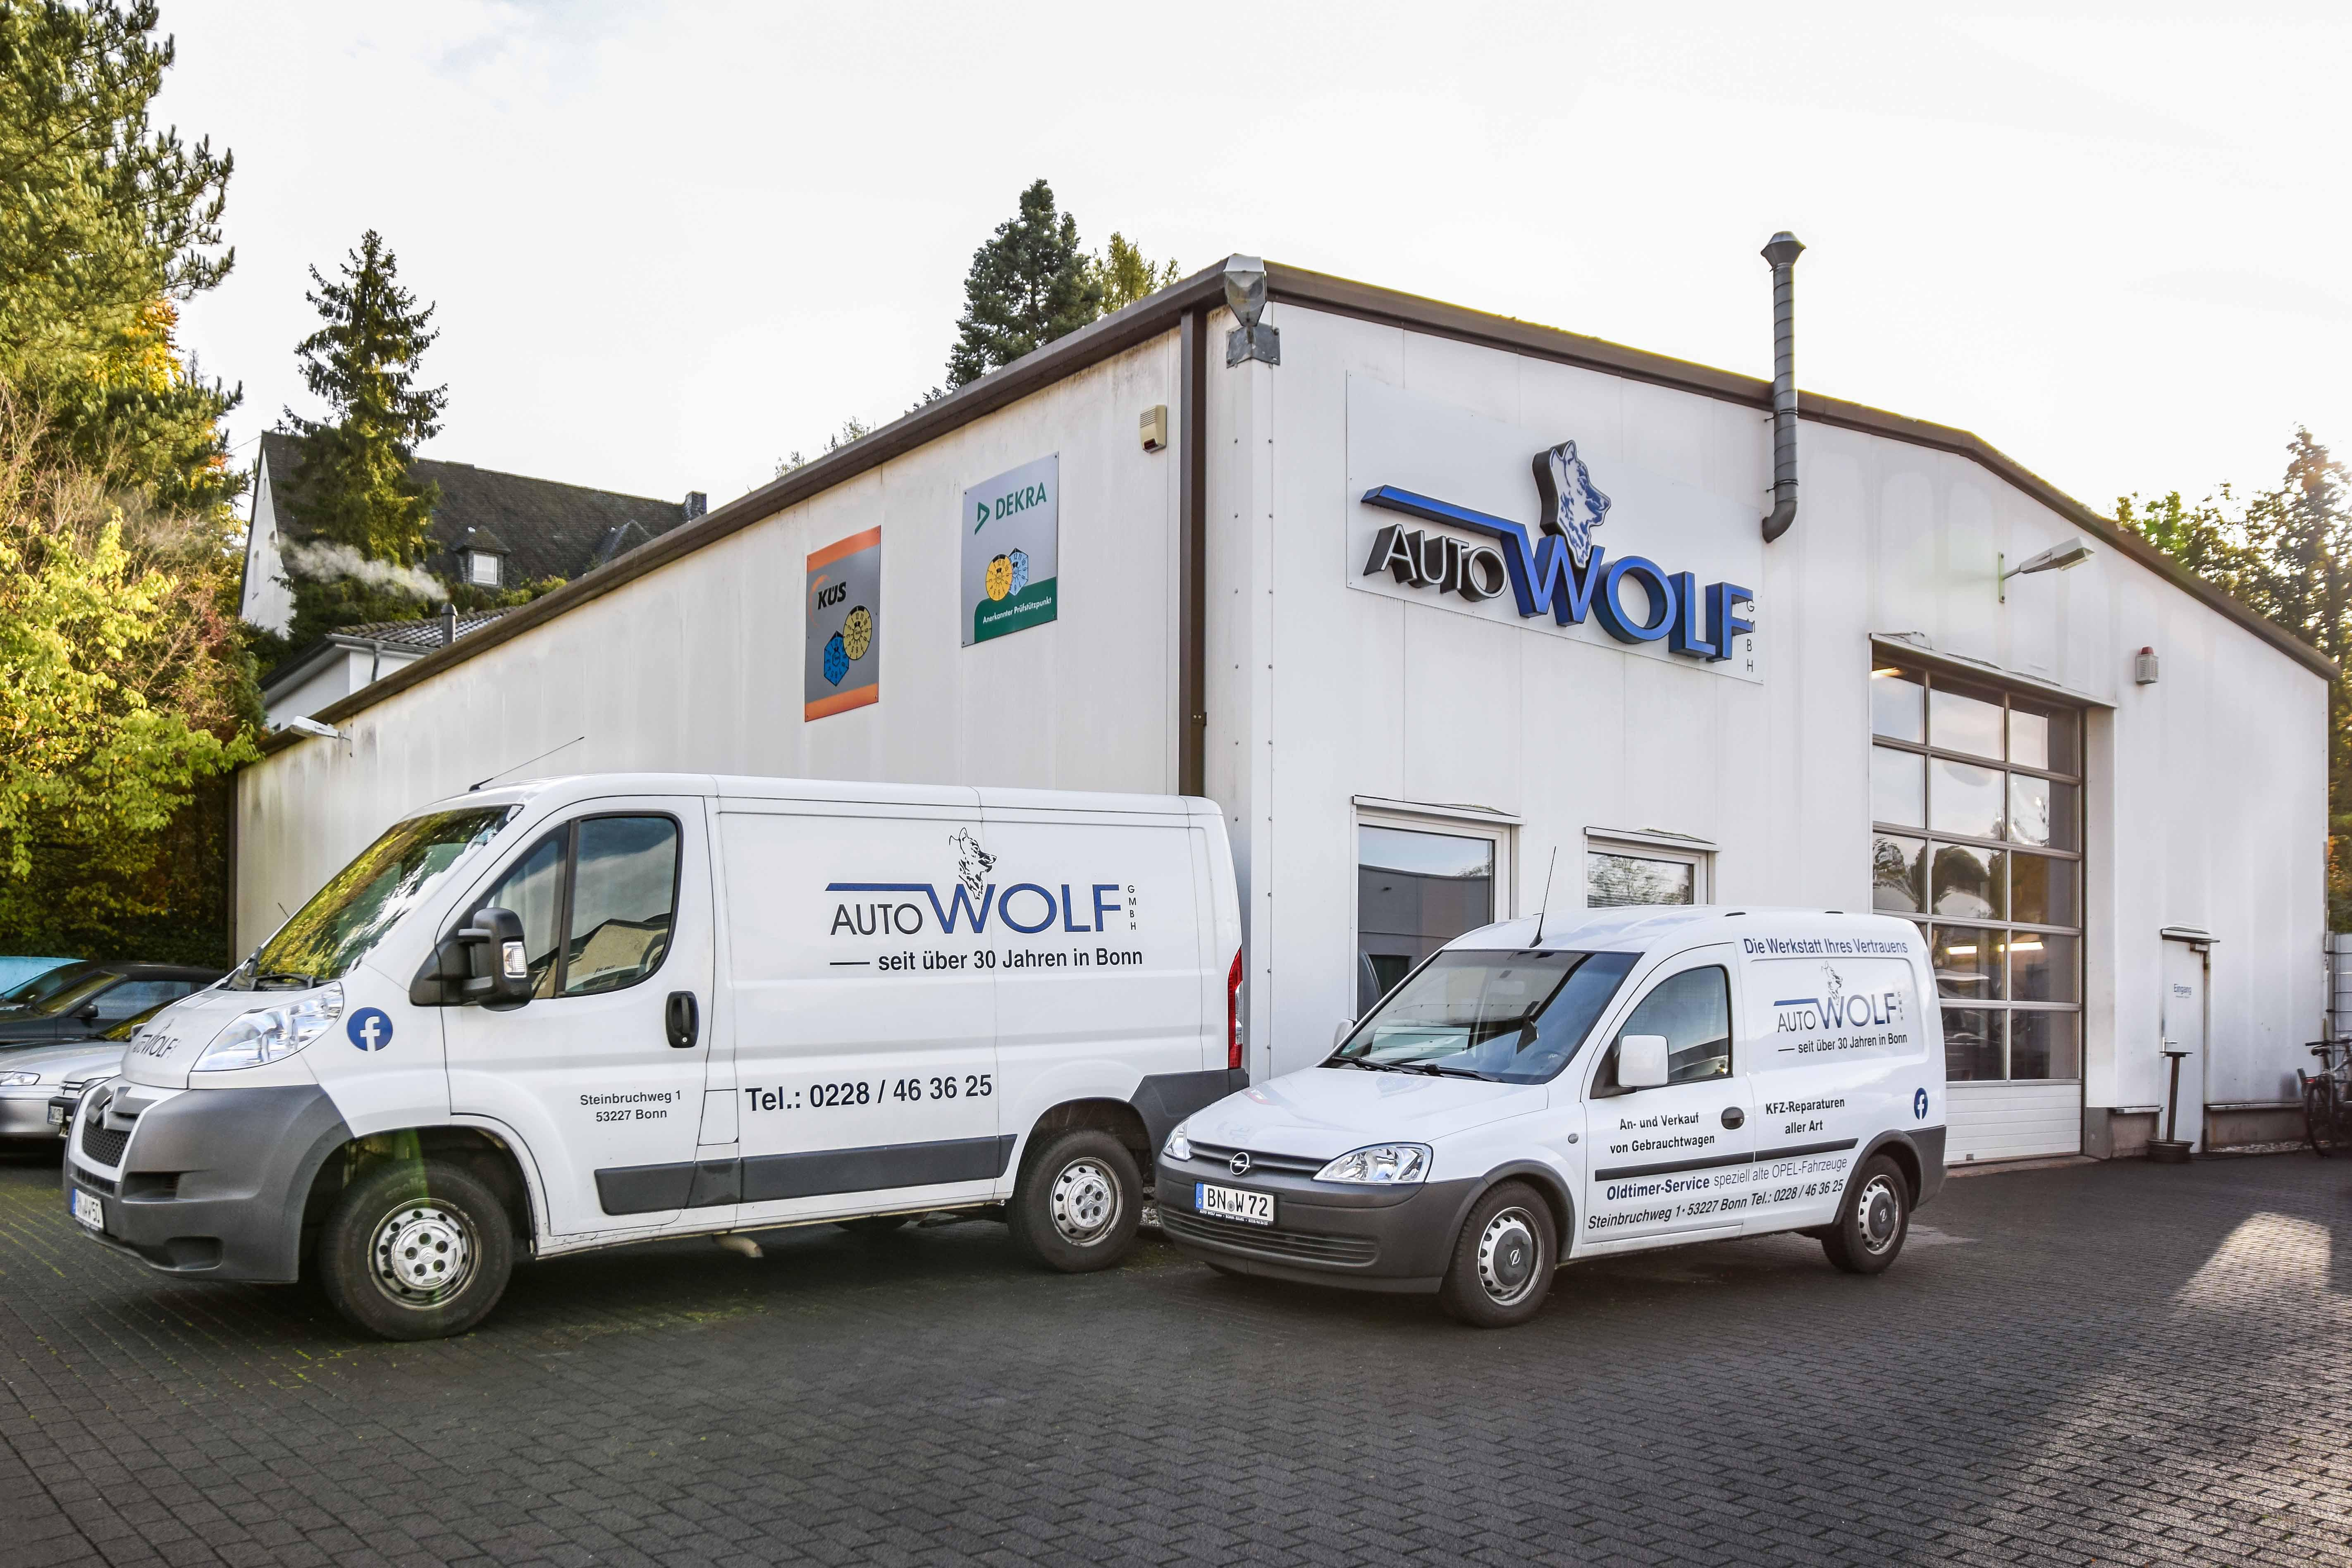 Auto Wolf GmbH KfZ-Meisterbetrieb | Bonn, Steinbruchweg 1 in Bonn